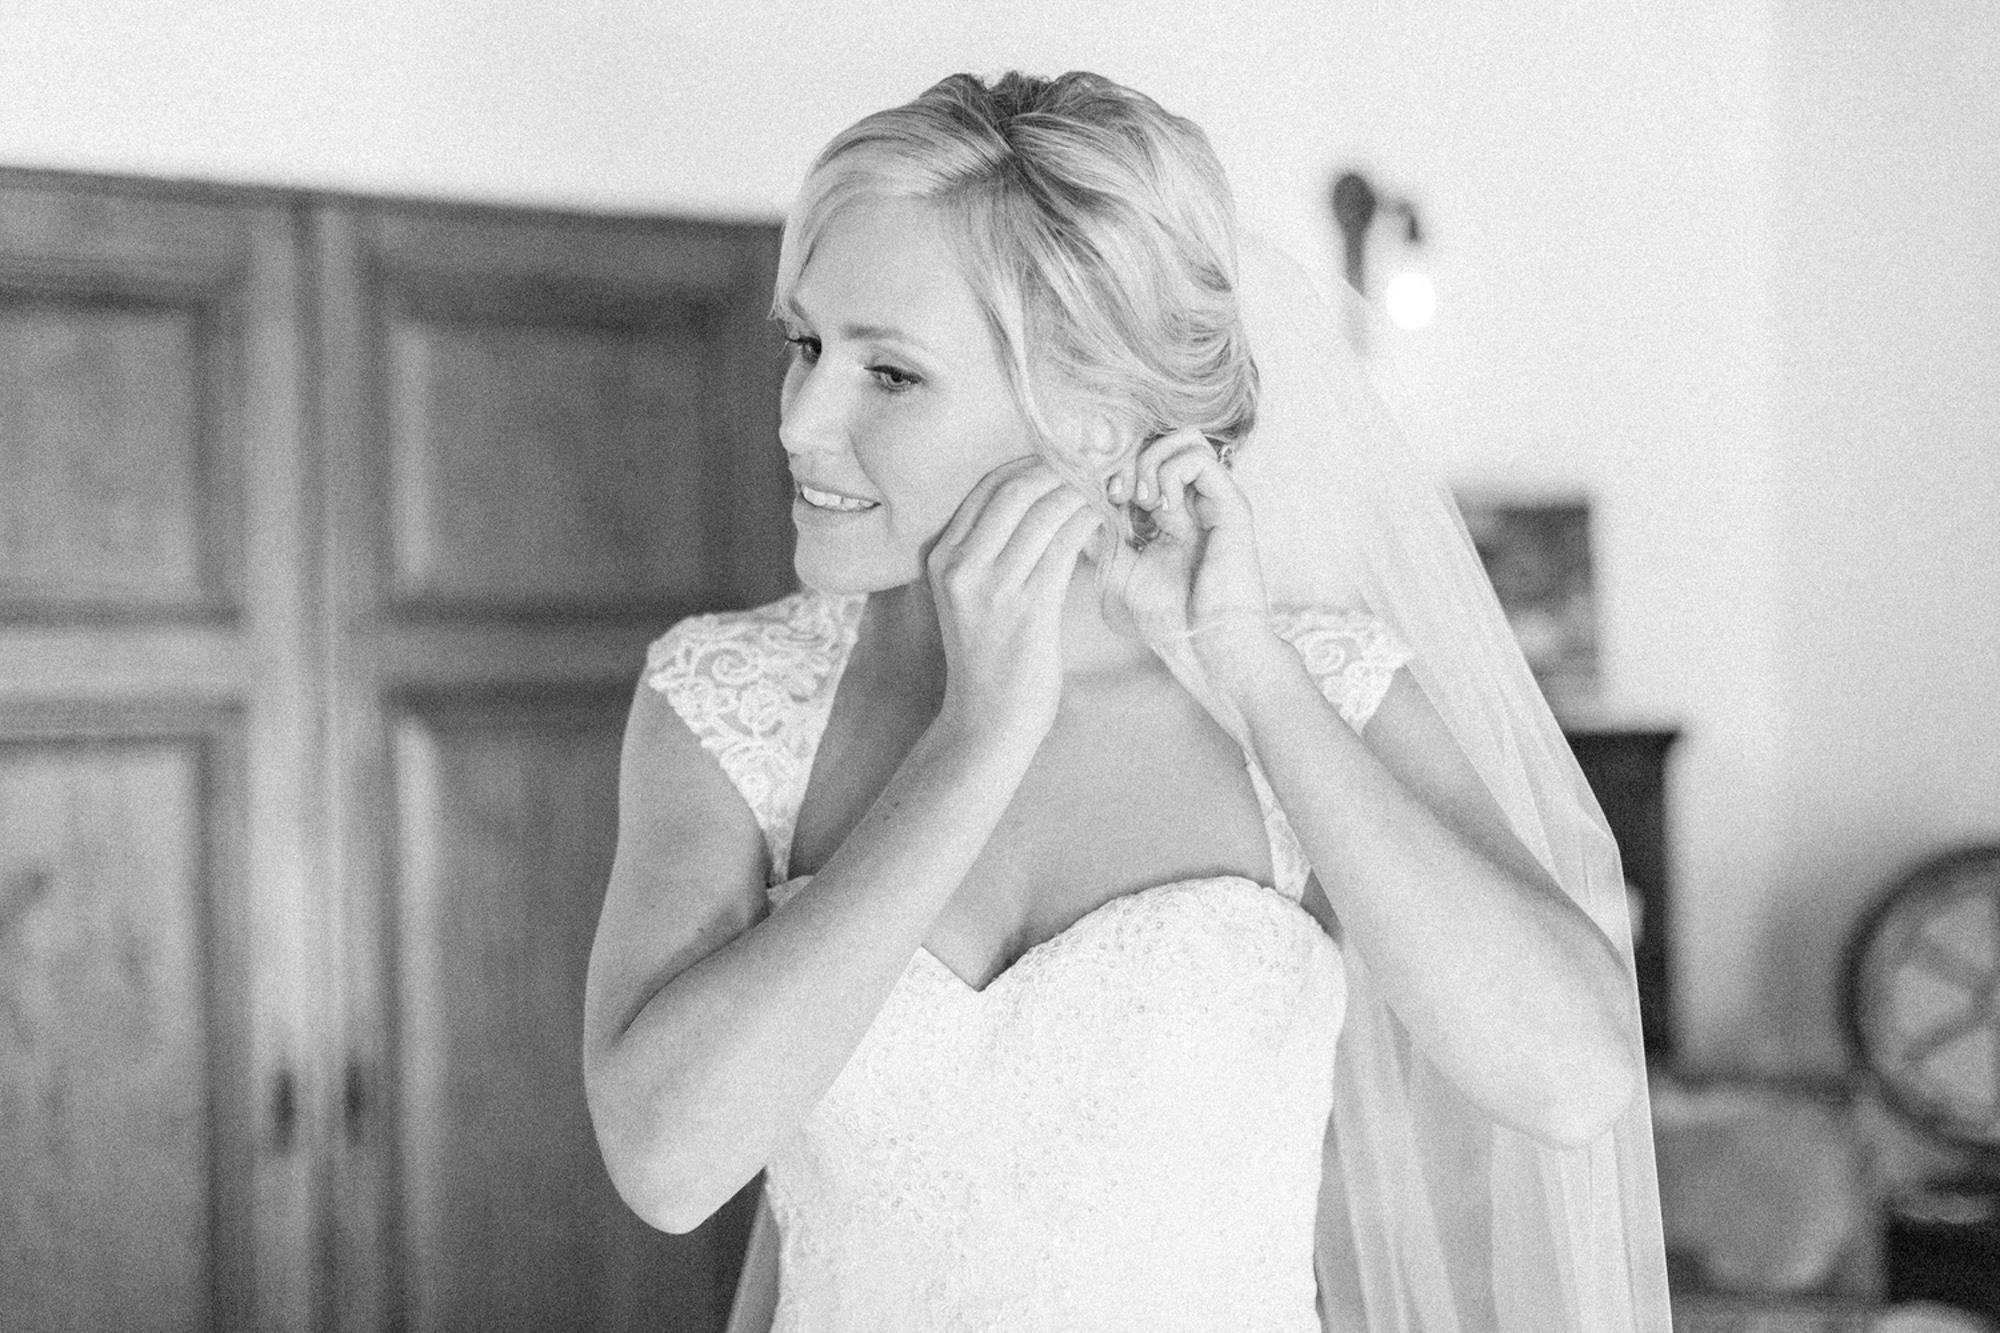 Villa-San-Juan-Capistrano-Wedding-Kristina-Adams-21.jpg